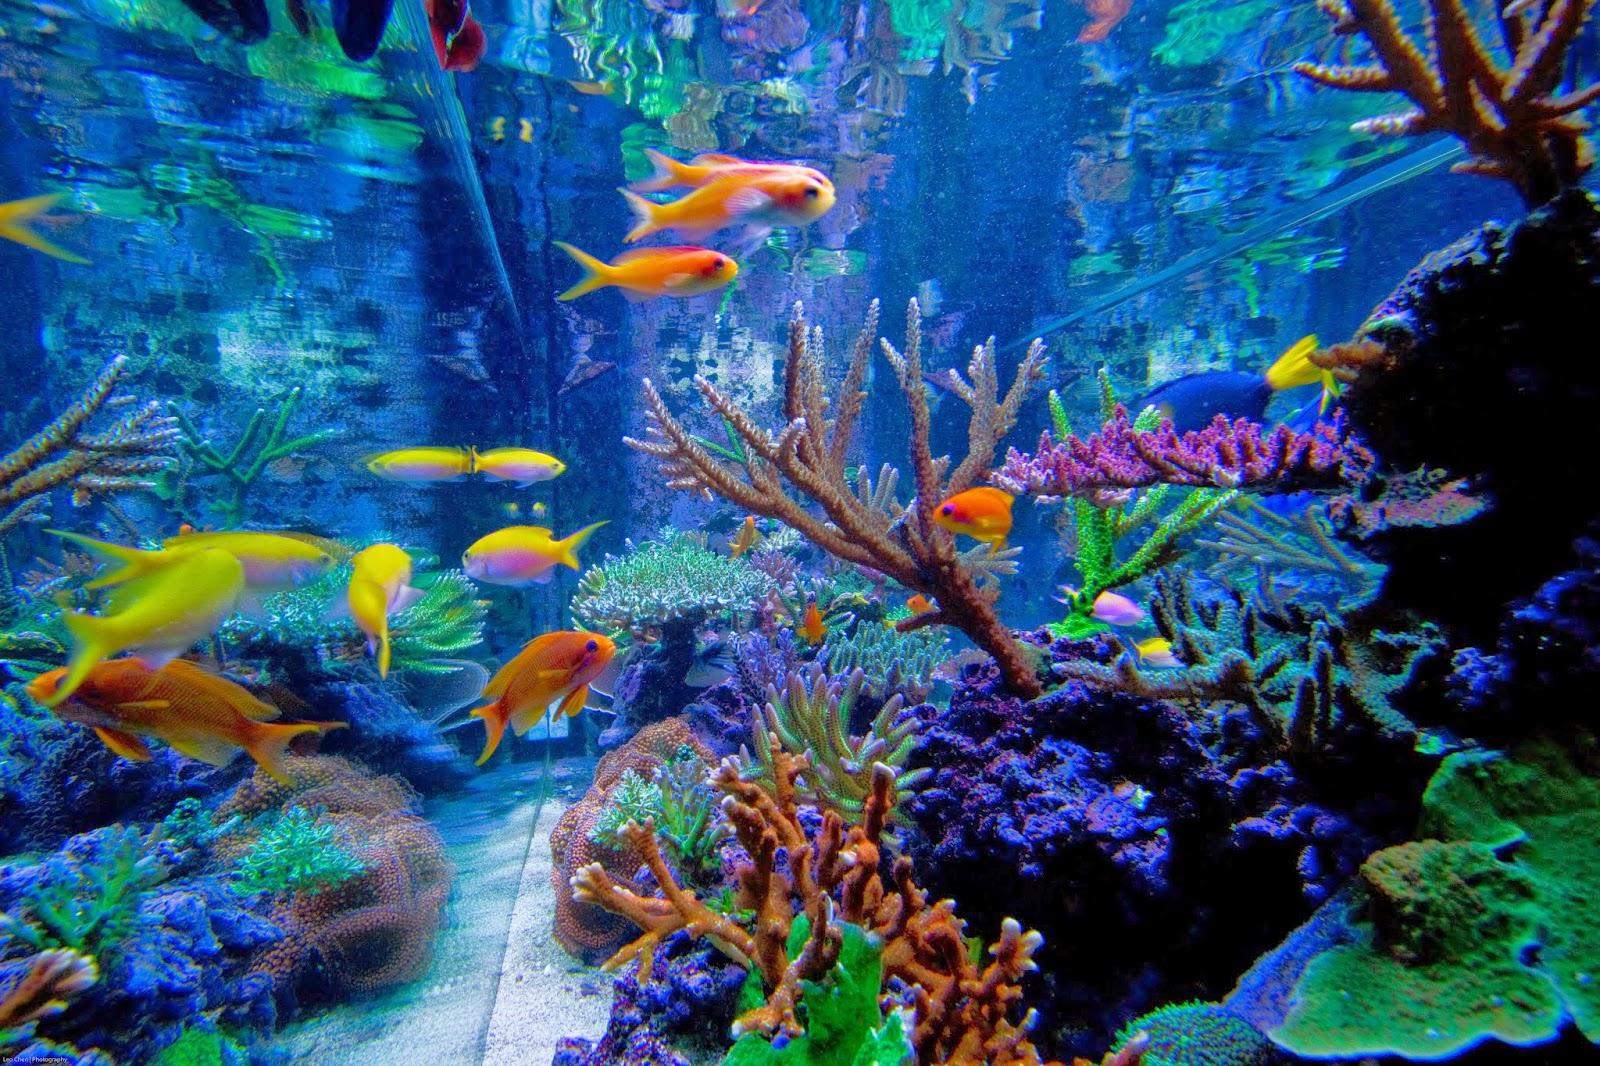 5 ways to change your aquarium water like a pro - Marine Depot Blog 10 Gallon Fish Tank Ideas